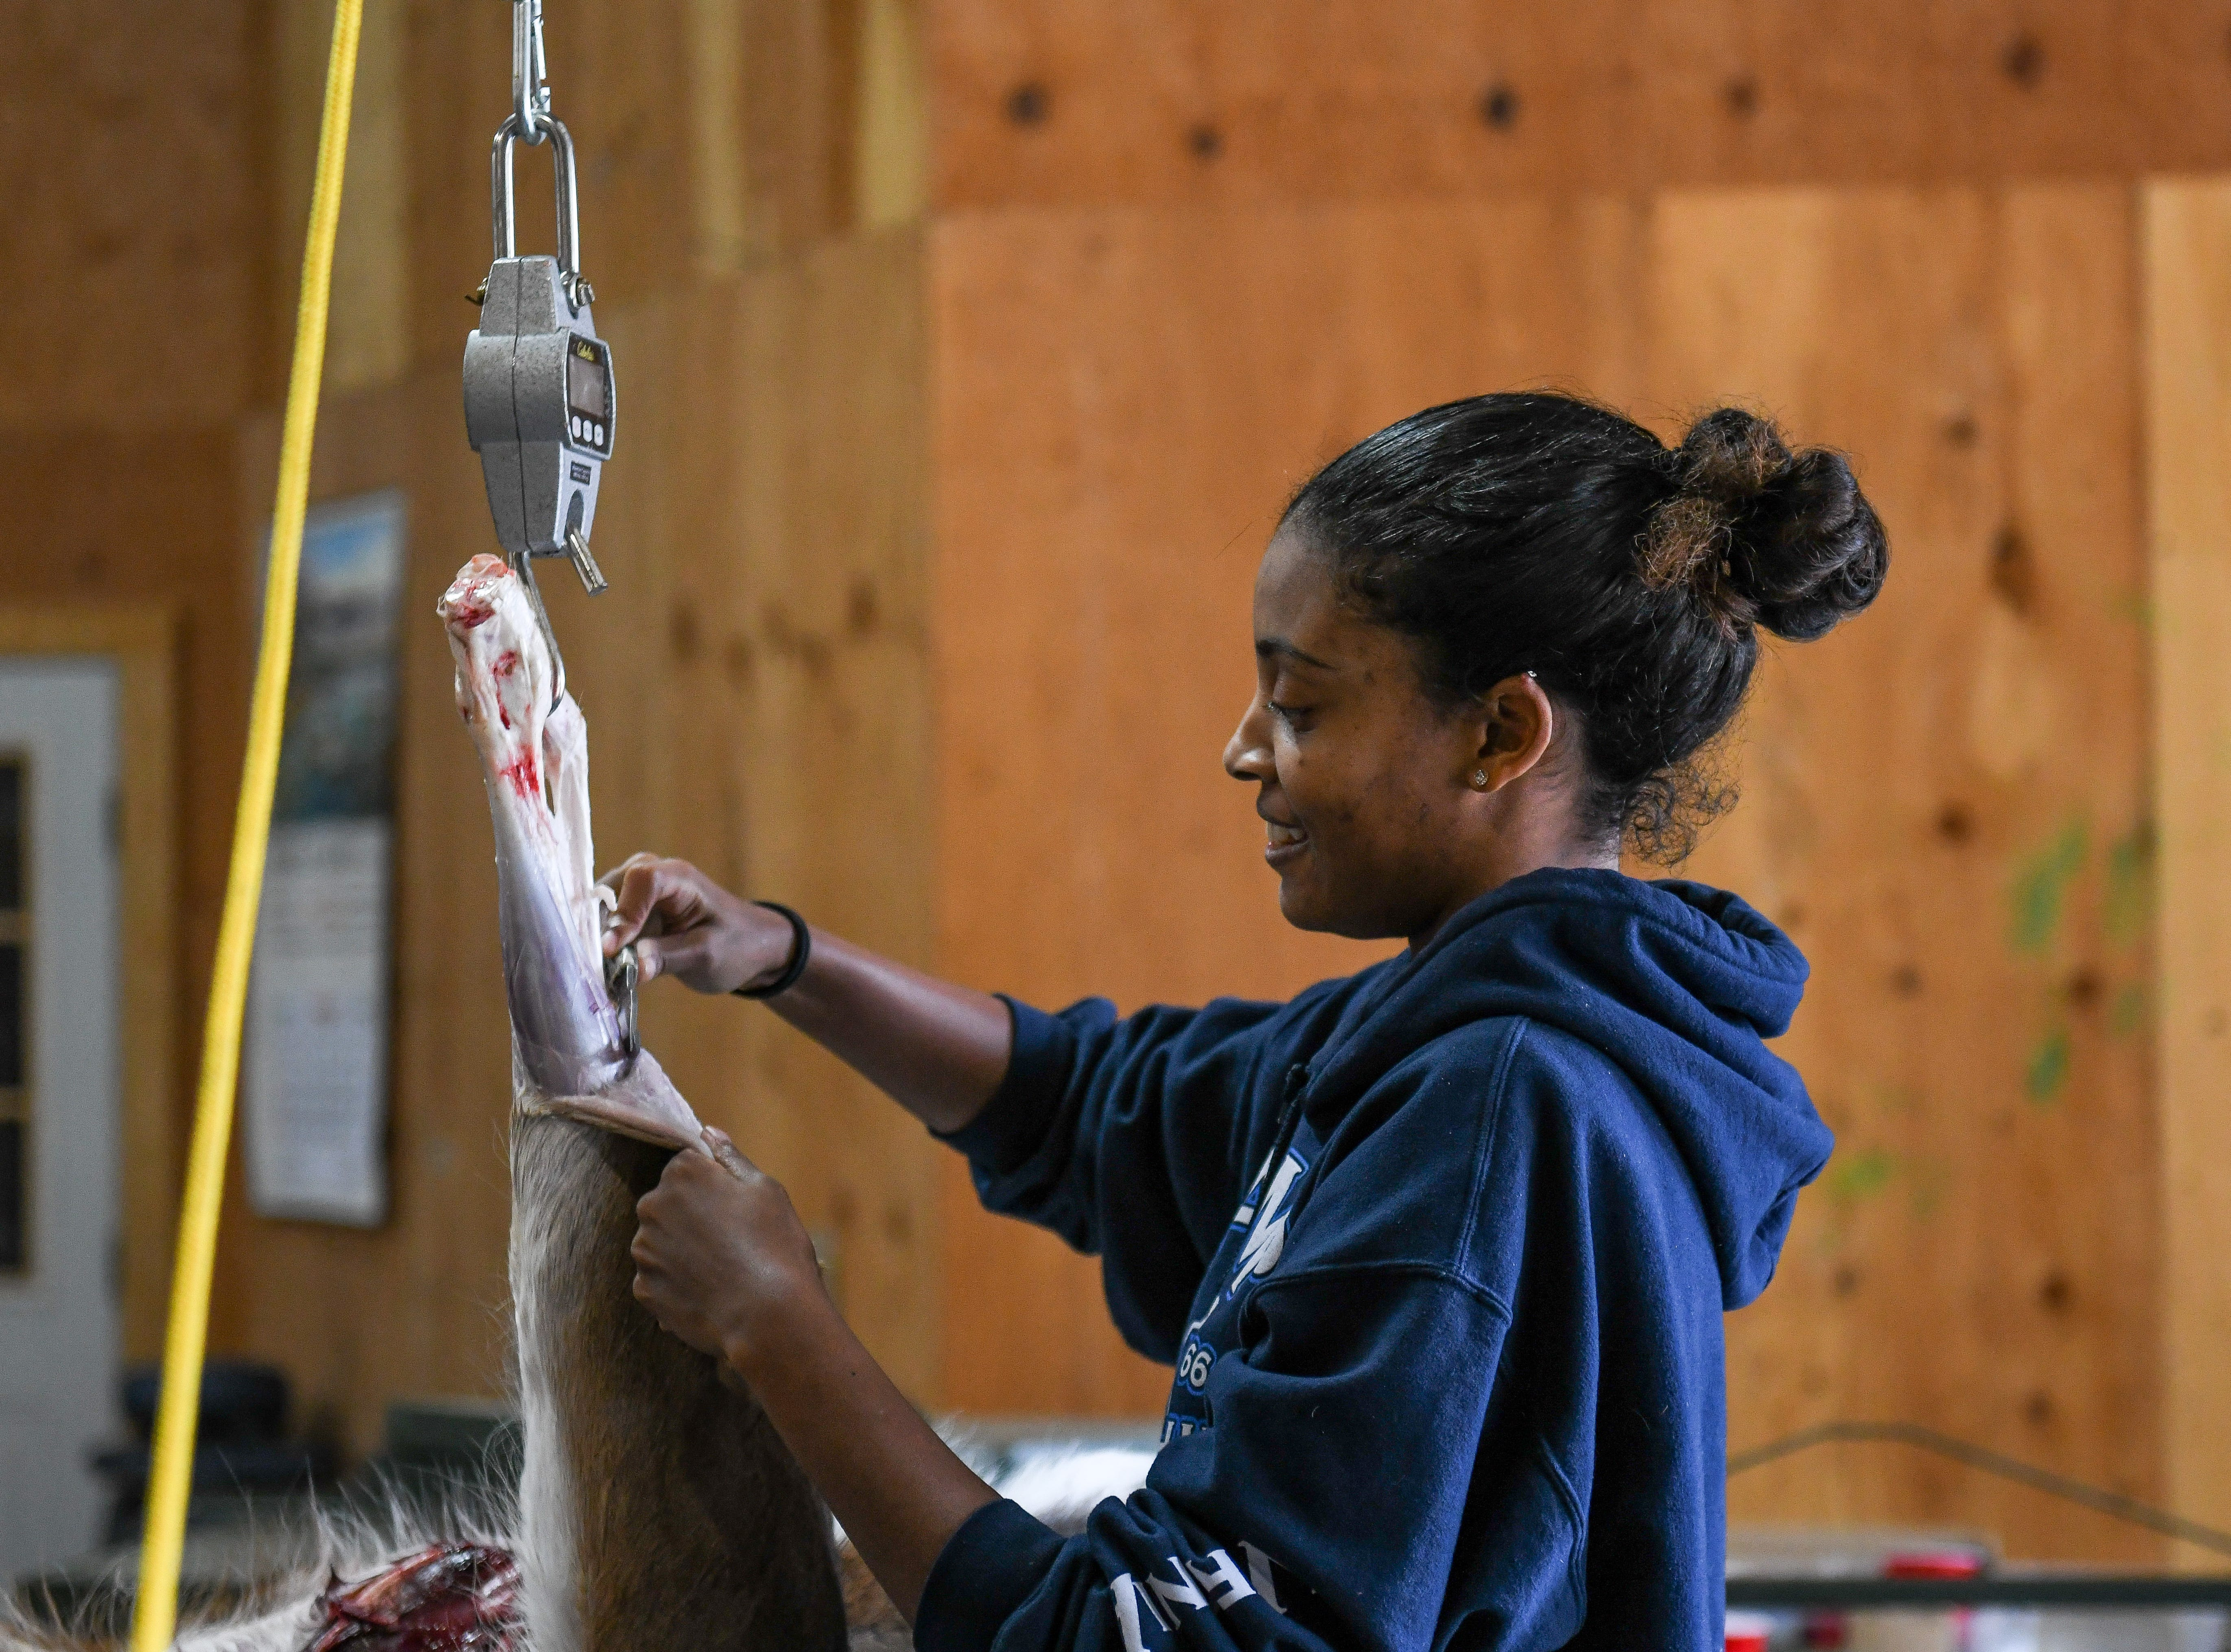 25-year-old Nettiel Stewart butchers her first deer in Mardela Springs on Tuesday, Nov 6, 2018.